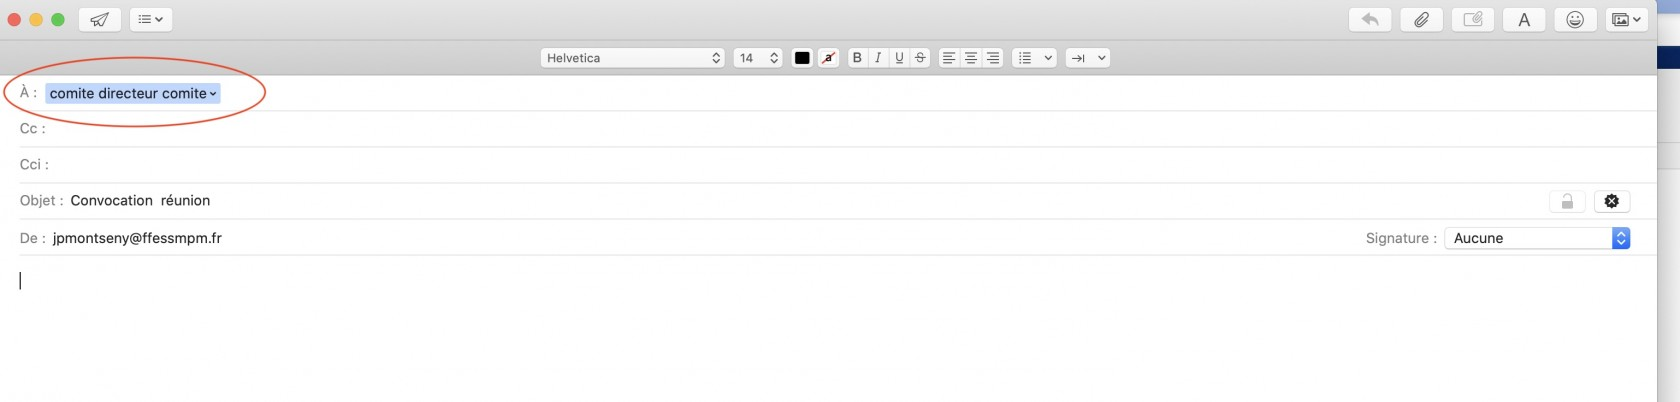 Site-form16.jpg